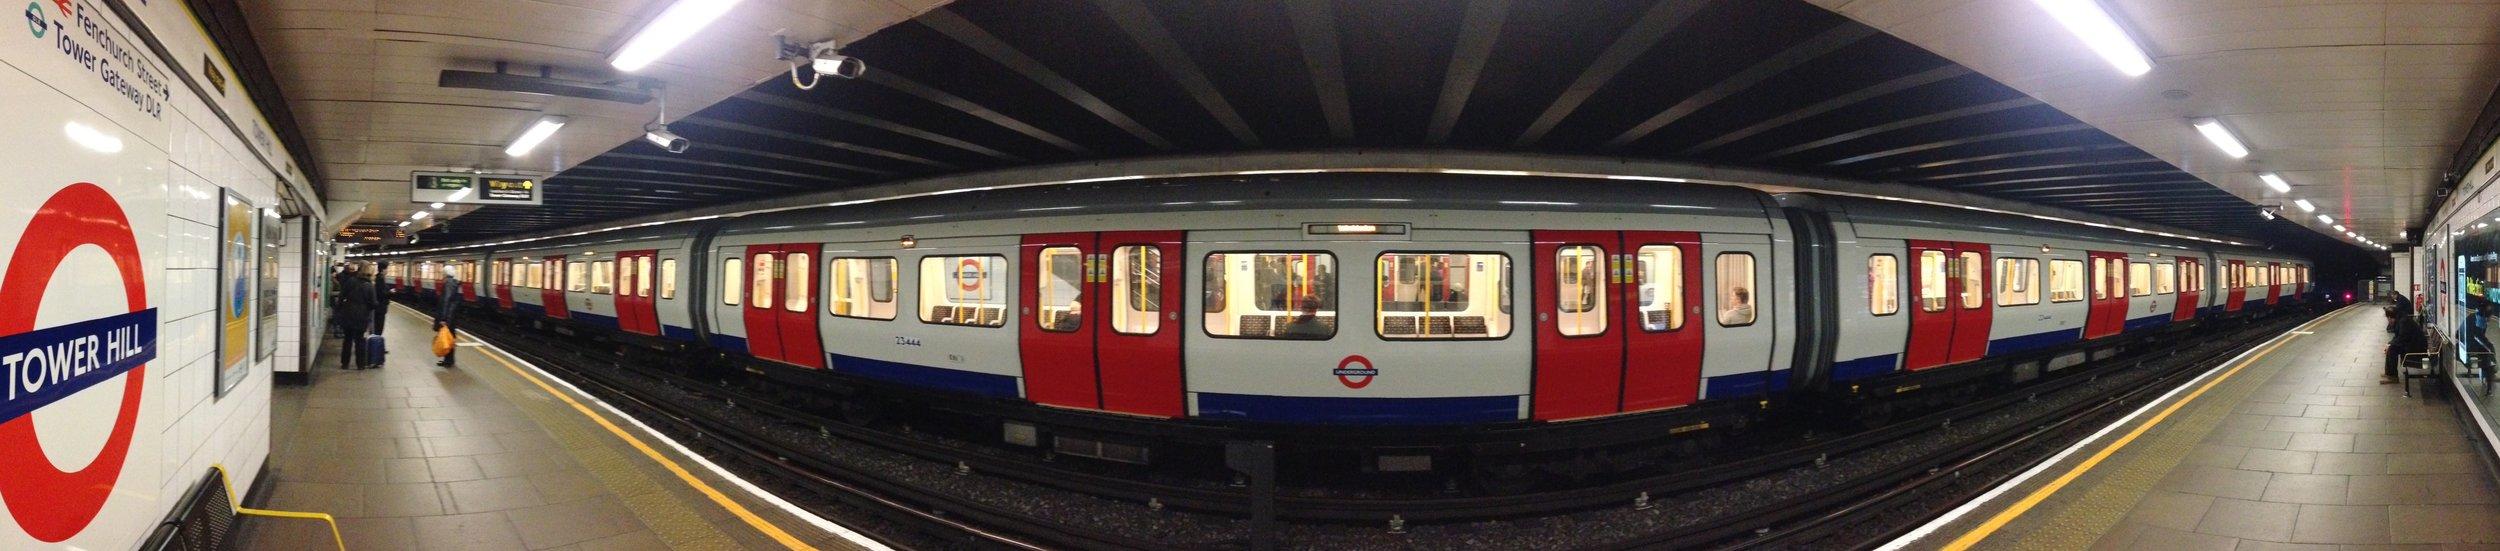 'Mind The Gap Please', London